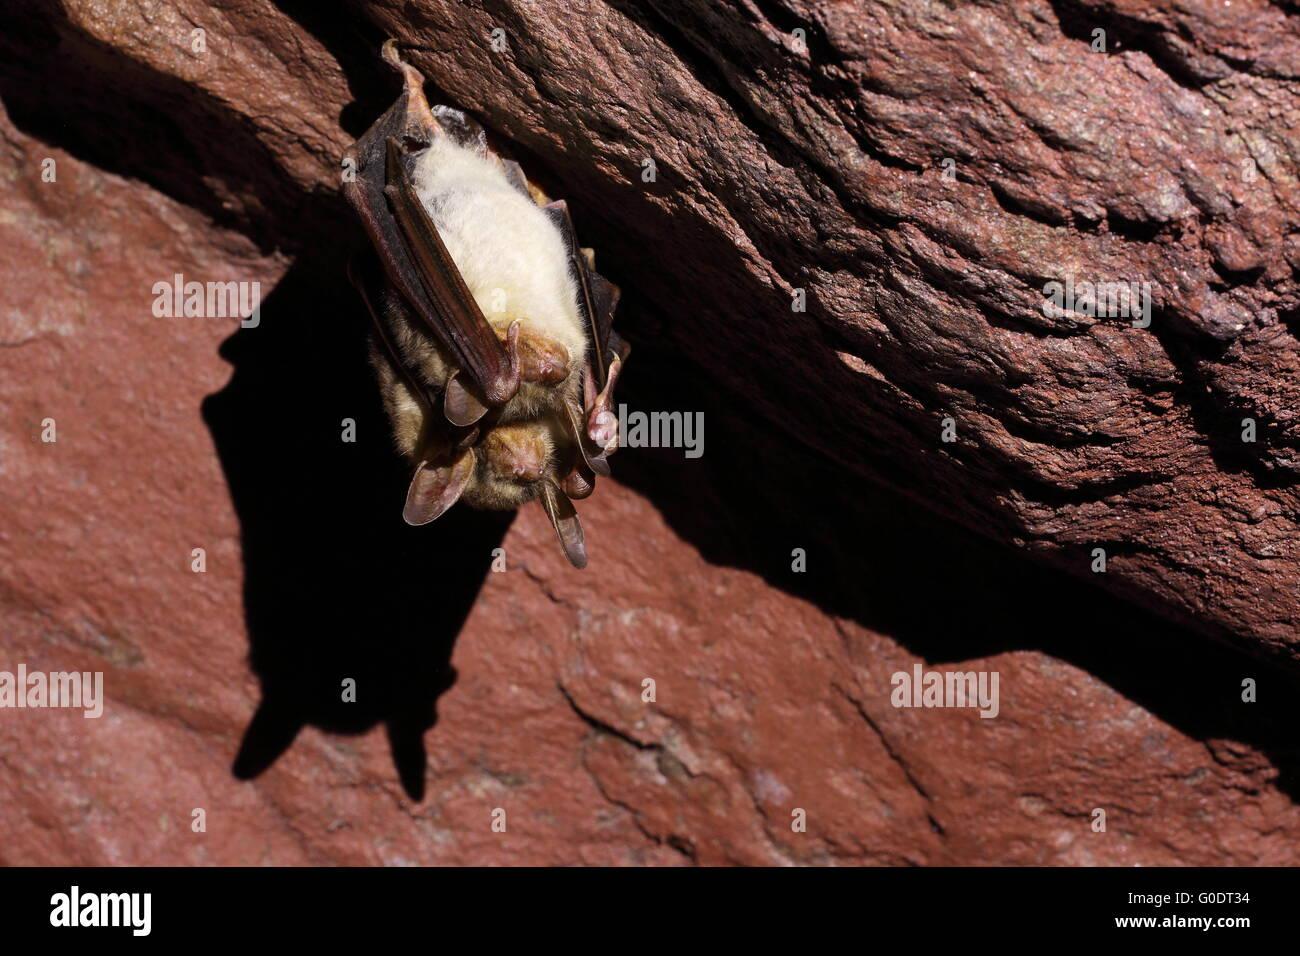 greater mouse-eared bat - hibernating in a mine ga - Stock Image